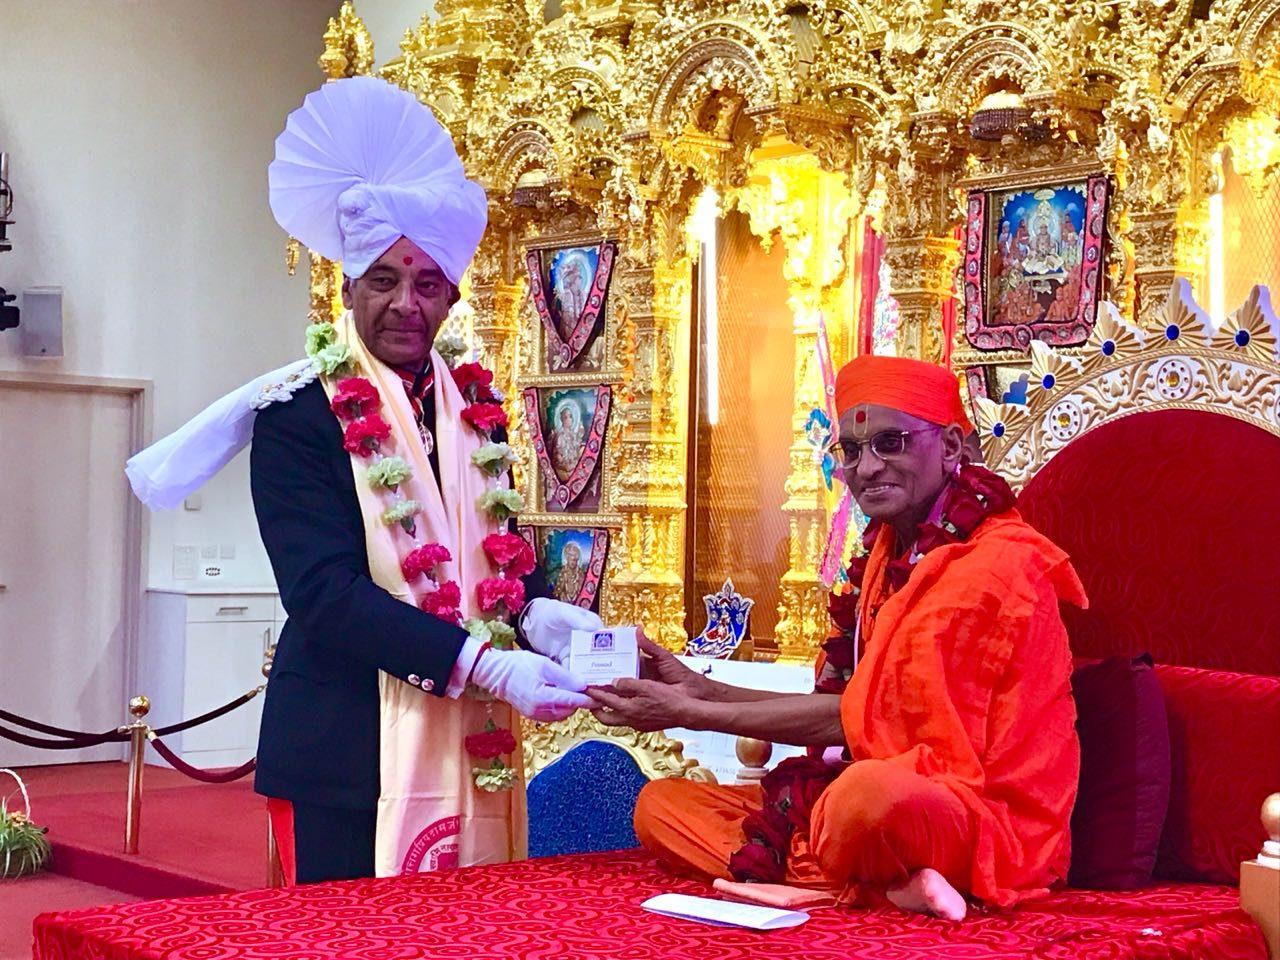 Sir Kenneth Olisa OBE met the global spiritual leader Acharya Swamishree Maharaj